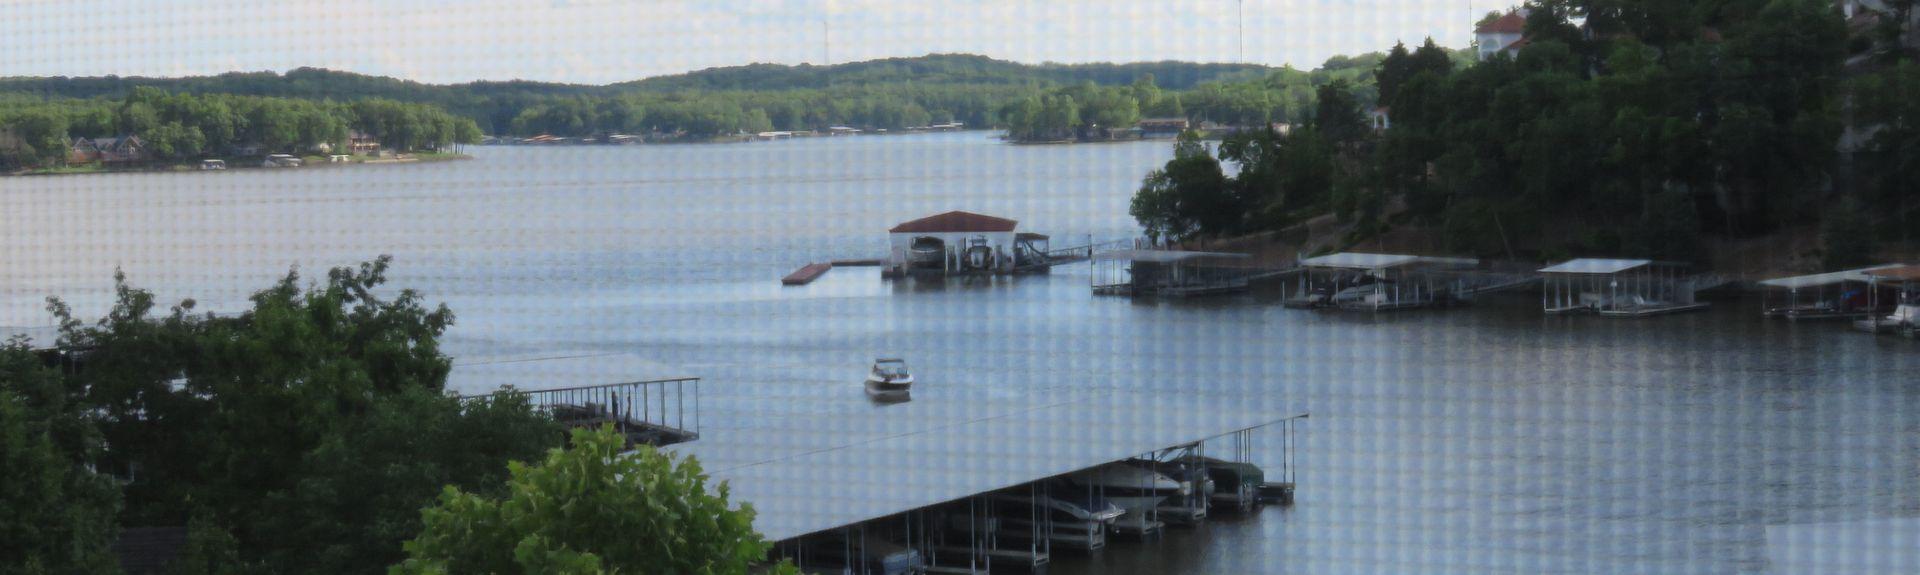 Regatta Bay Lake Ozark Vacation Rentals House Rentals More Vrbo